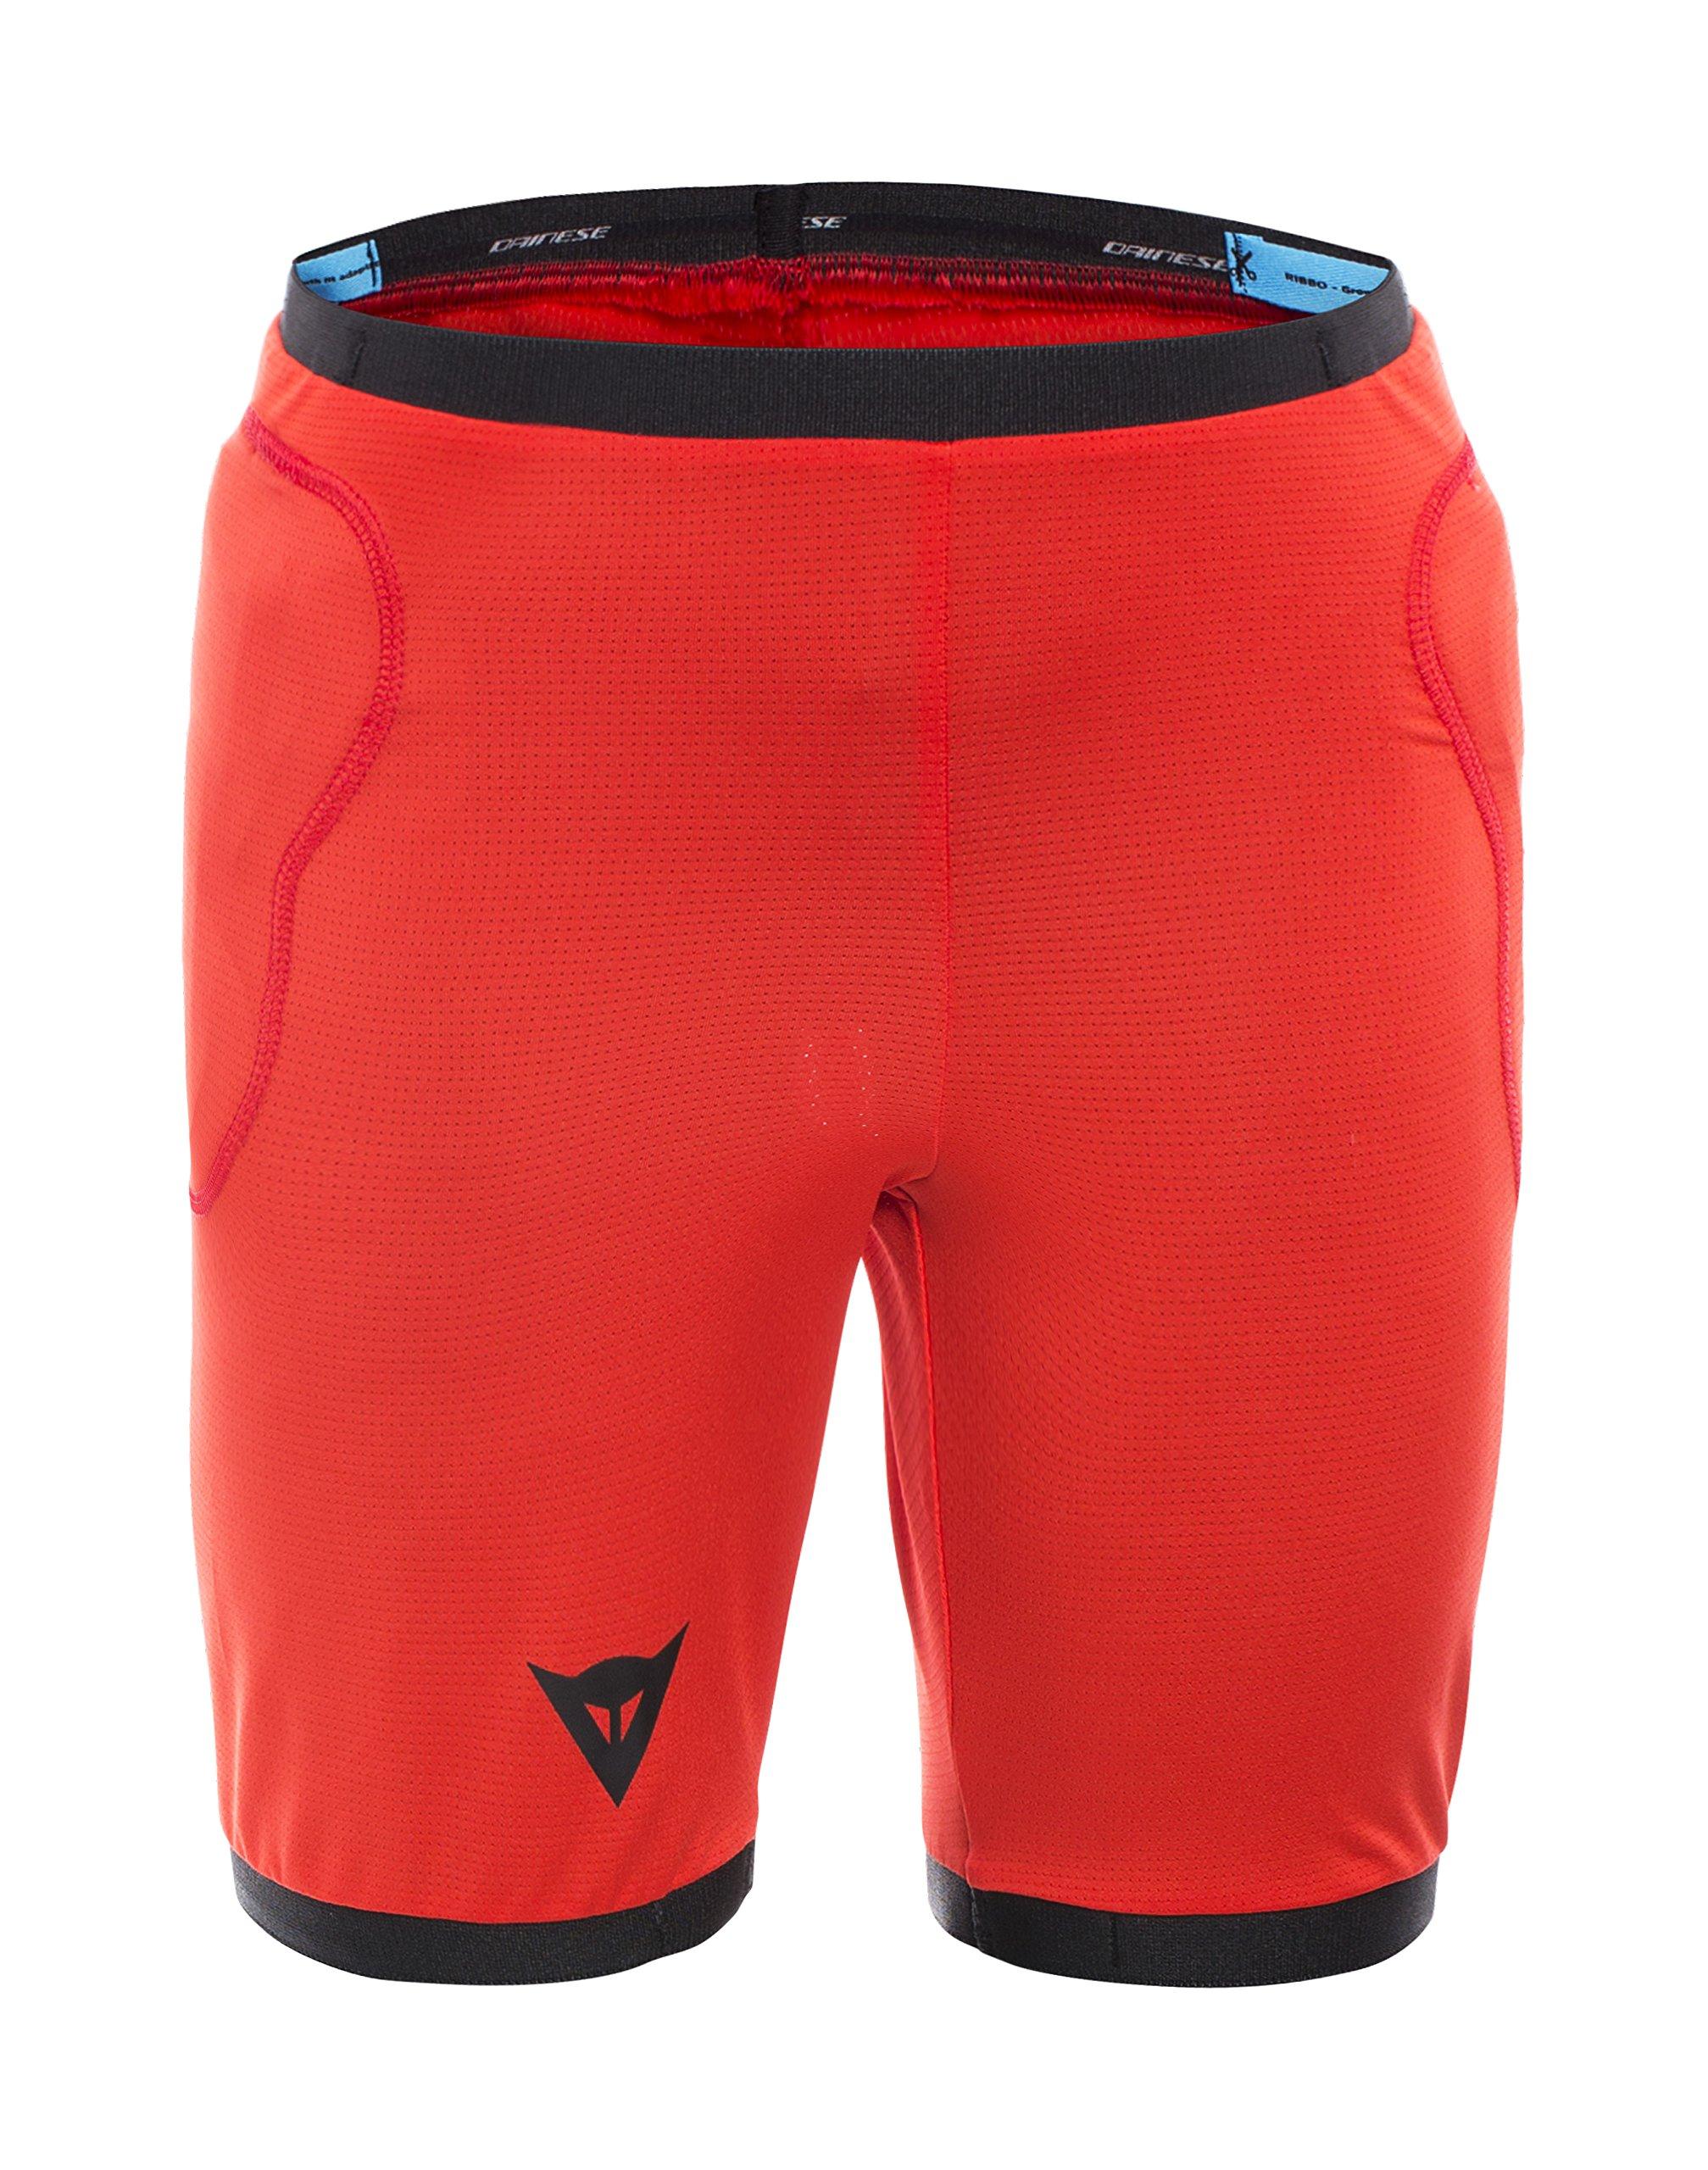 Dainese Boys Scarabeo Safety Shorts, Black/Red, Medium